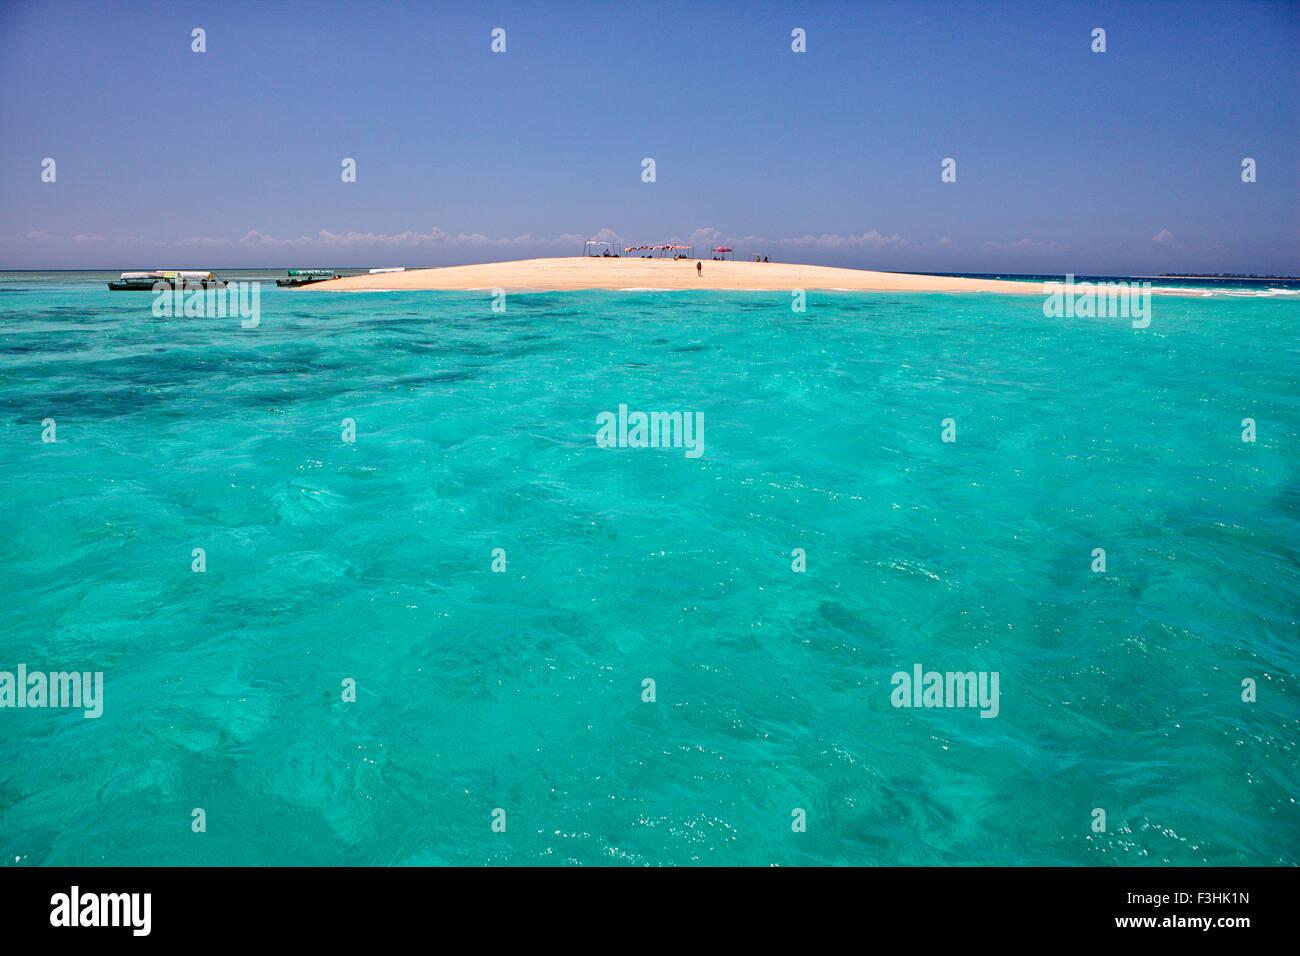 Tanzania, Zanzibar, Unguja, Niamembe Island. - Stock Image